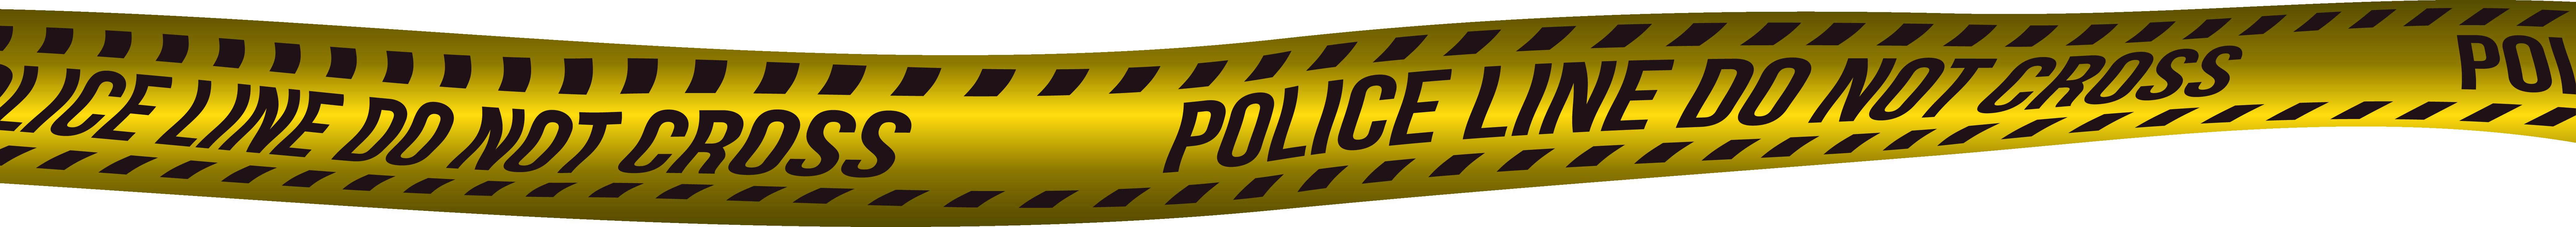 police clipart crime